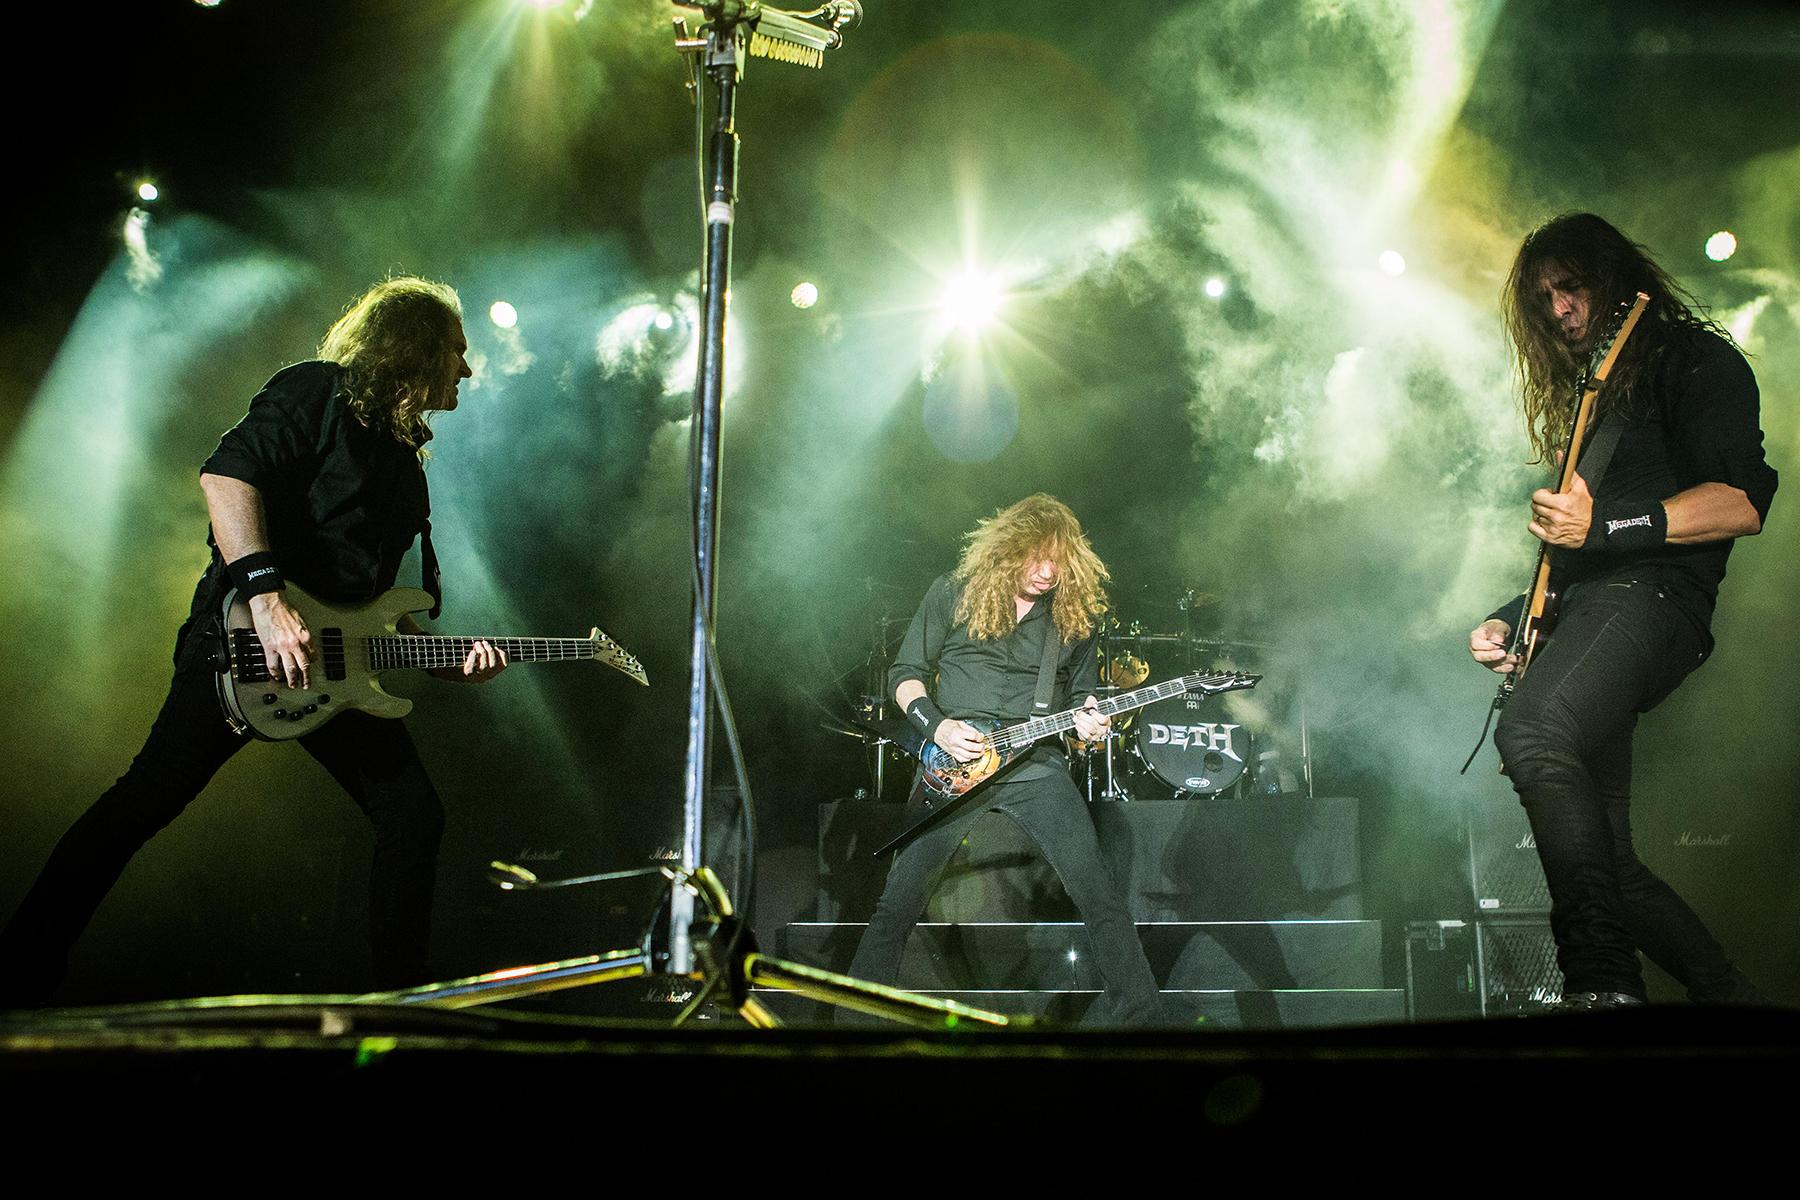 MegadethMegadeth in concert at Carroponte, Milan, Italy - 08 Aug 2017